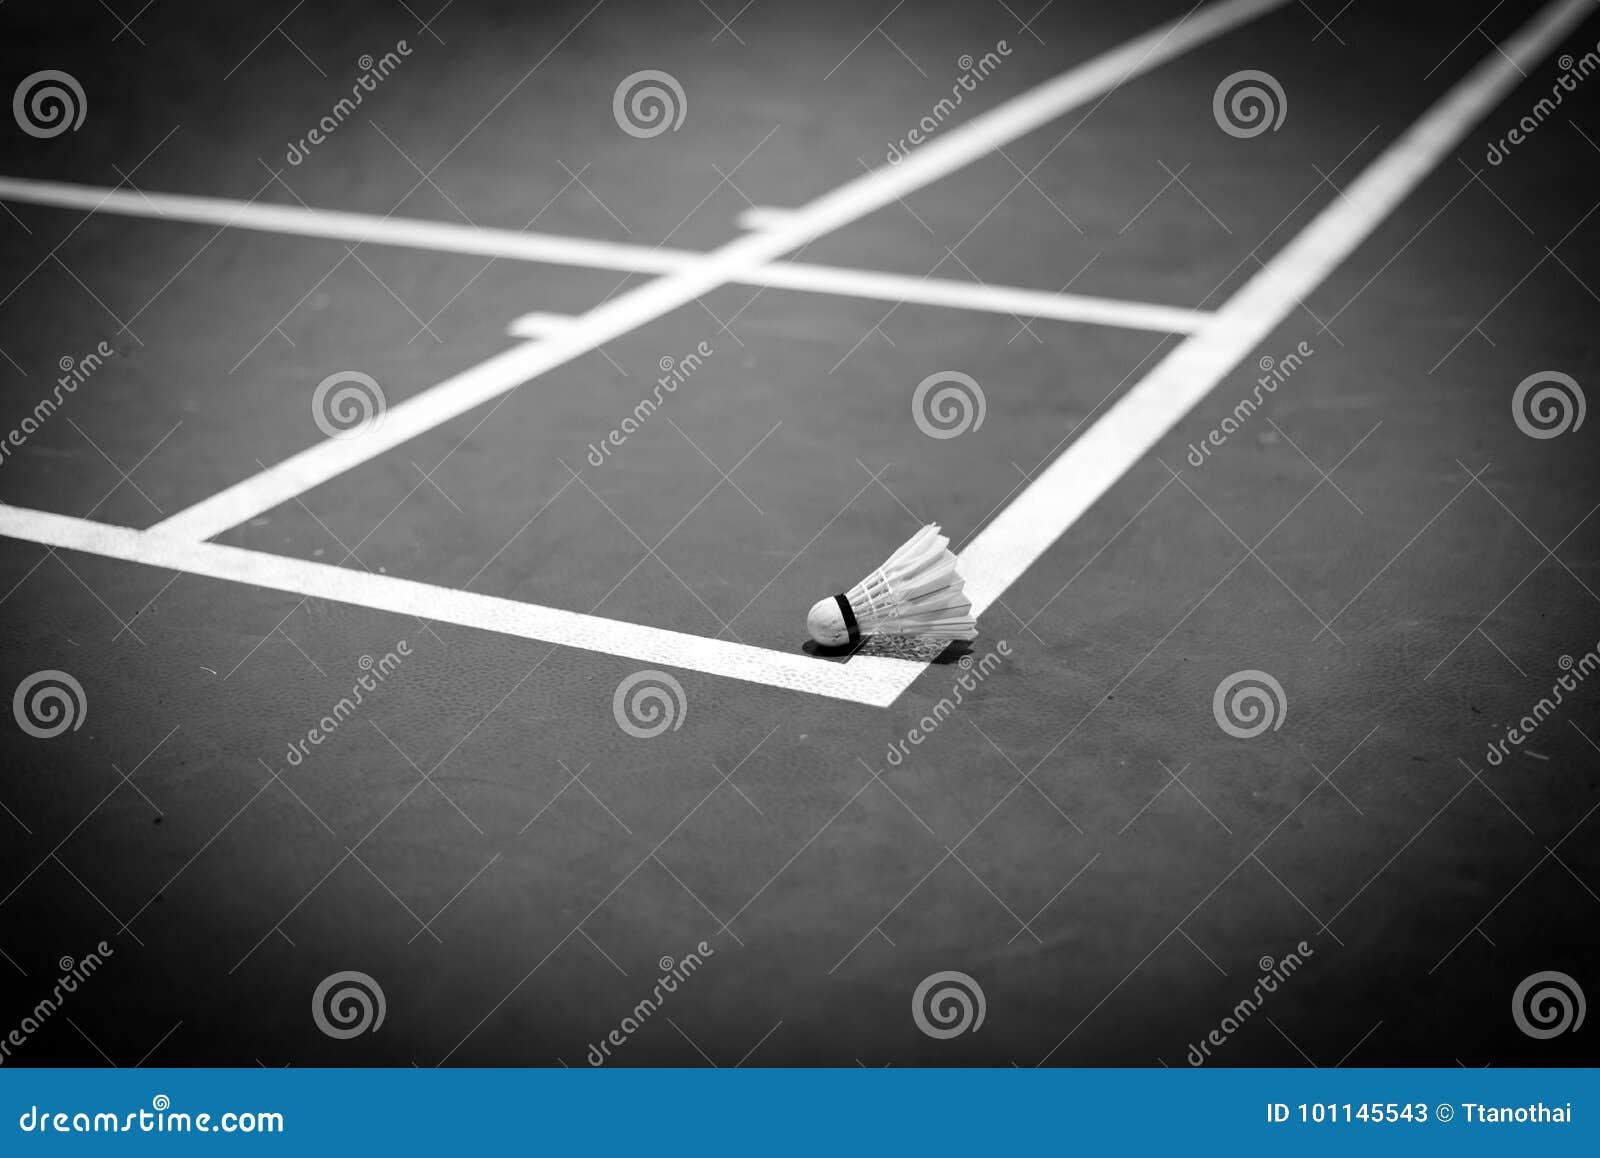 Peteca do badminton na corte, tom preto e branco